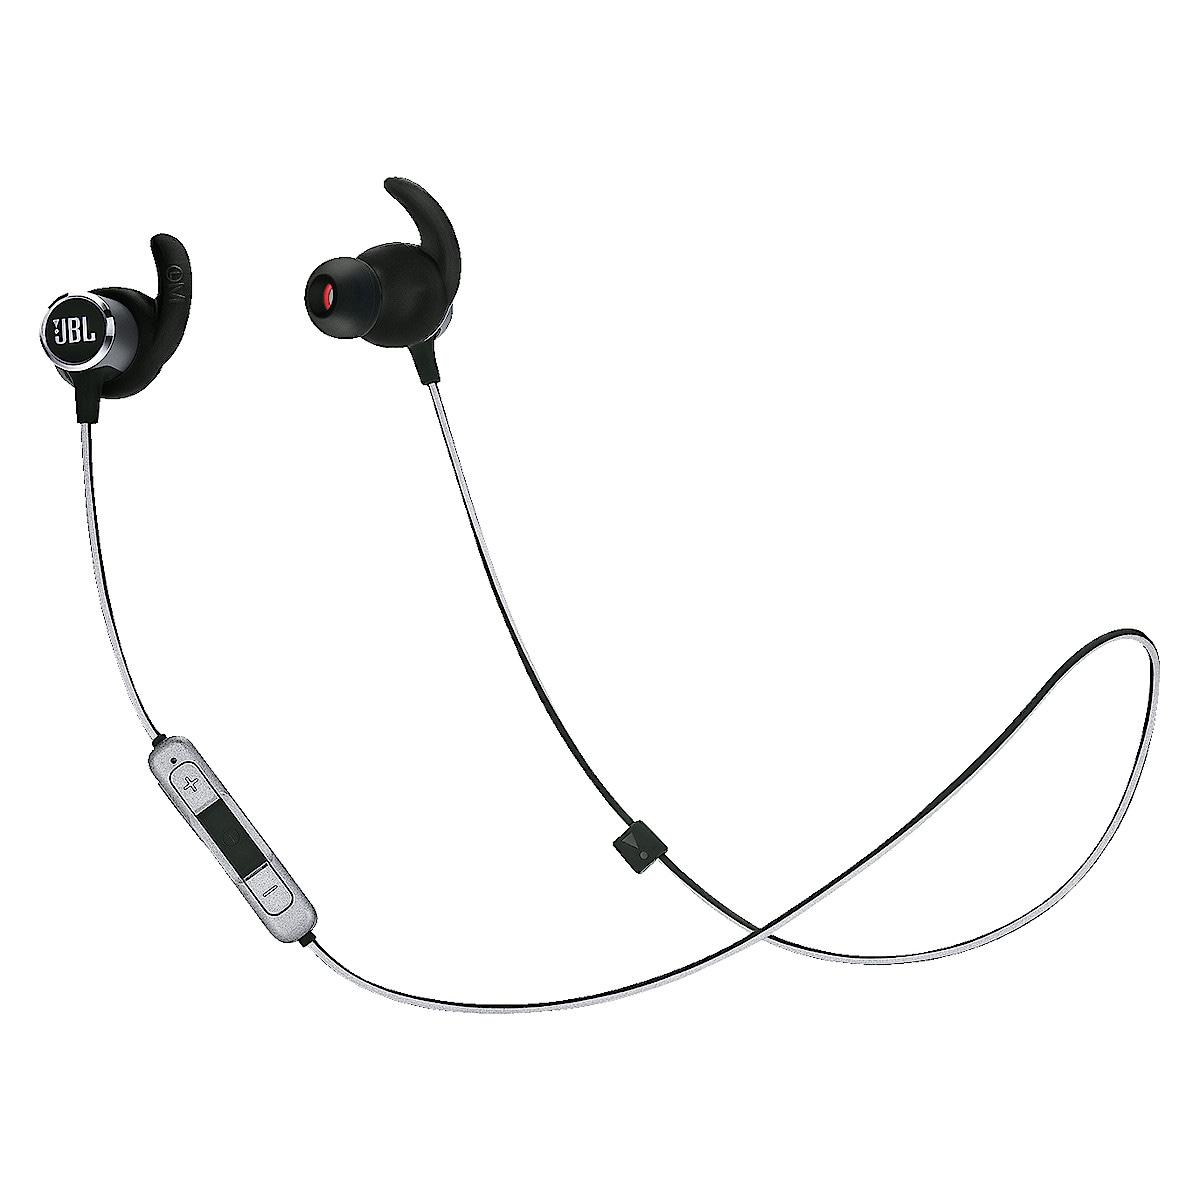 Trådlösa hörlurar med mikrofon, JBL Reflect Mini 2